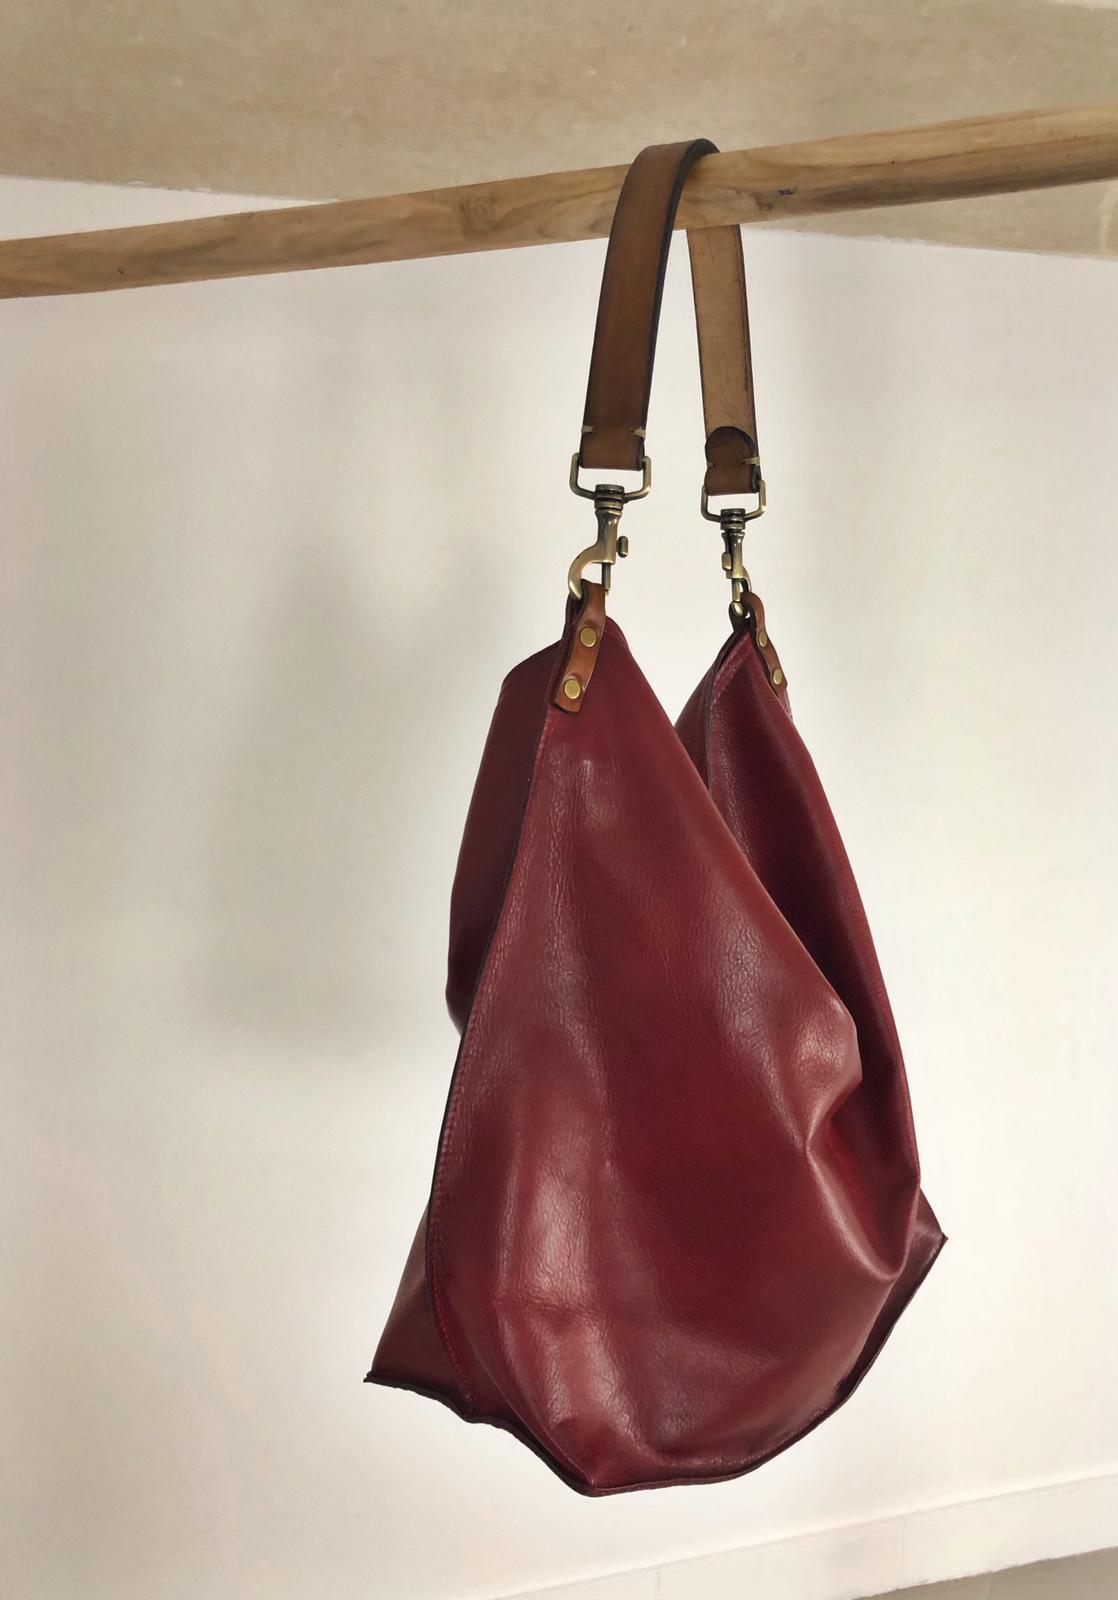 ALLEGRA BAG handmade leather bag image 3